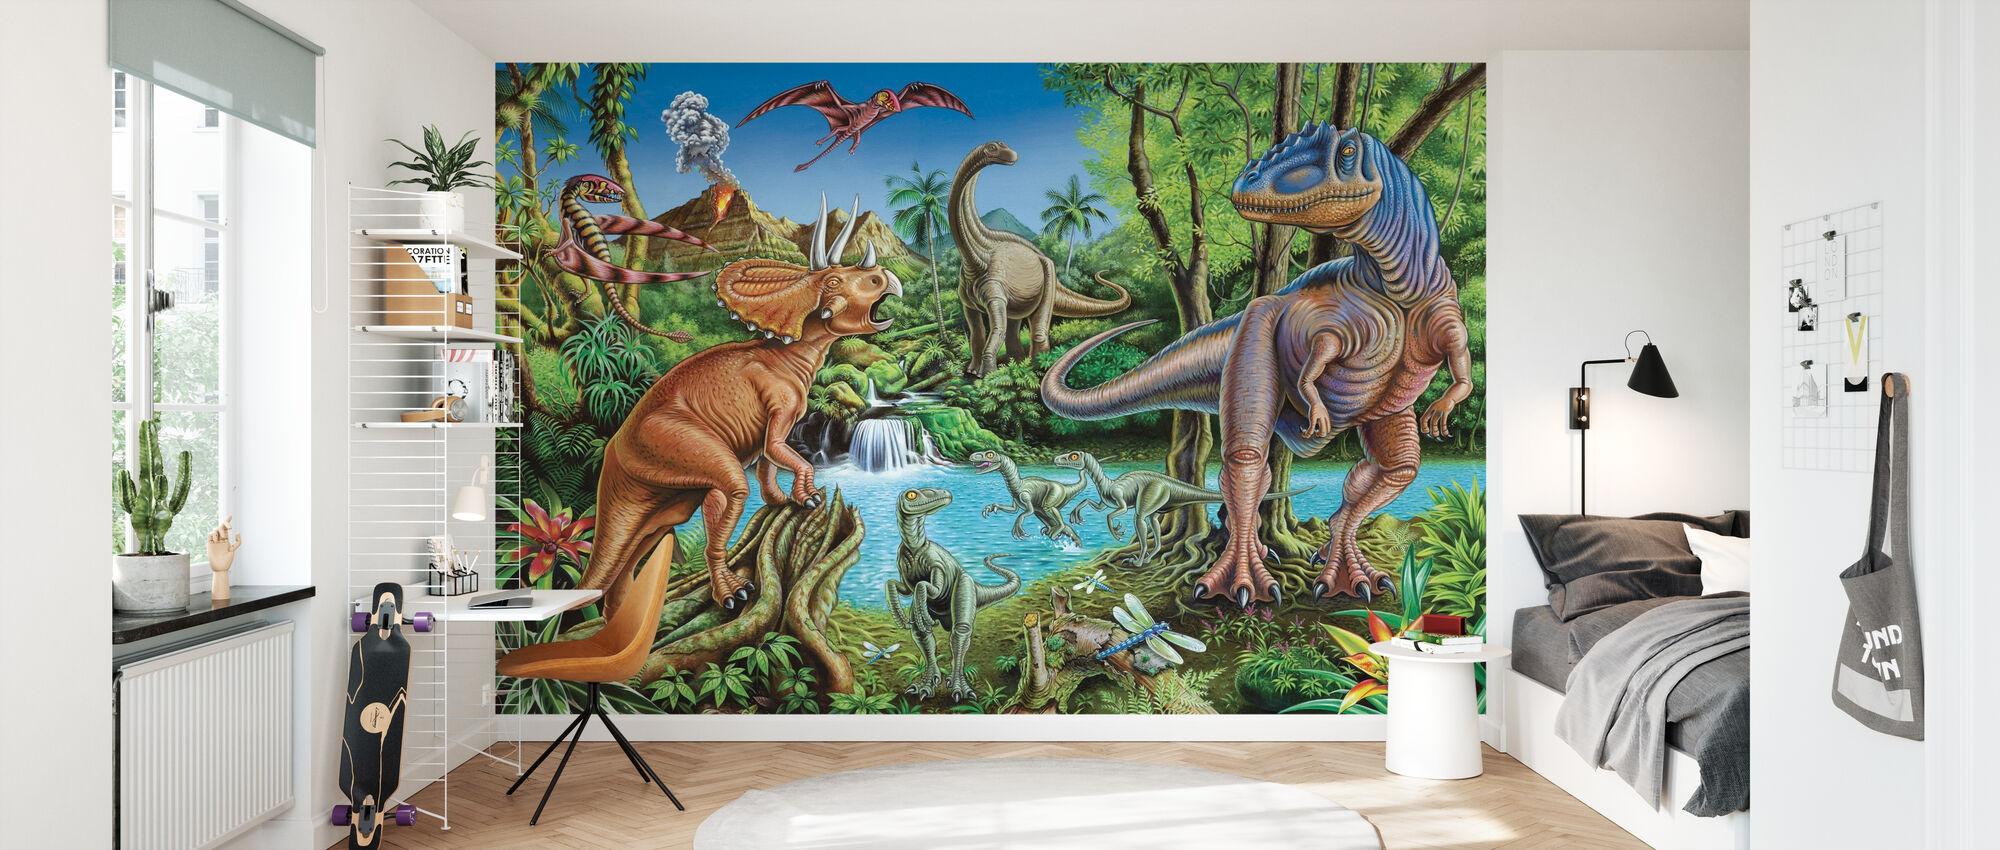 Dinosaur Waterfall - Wallpaper - Kids Room